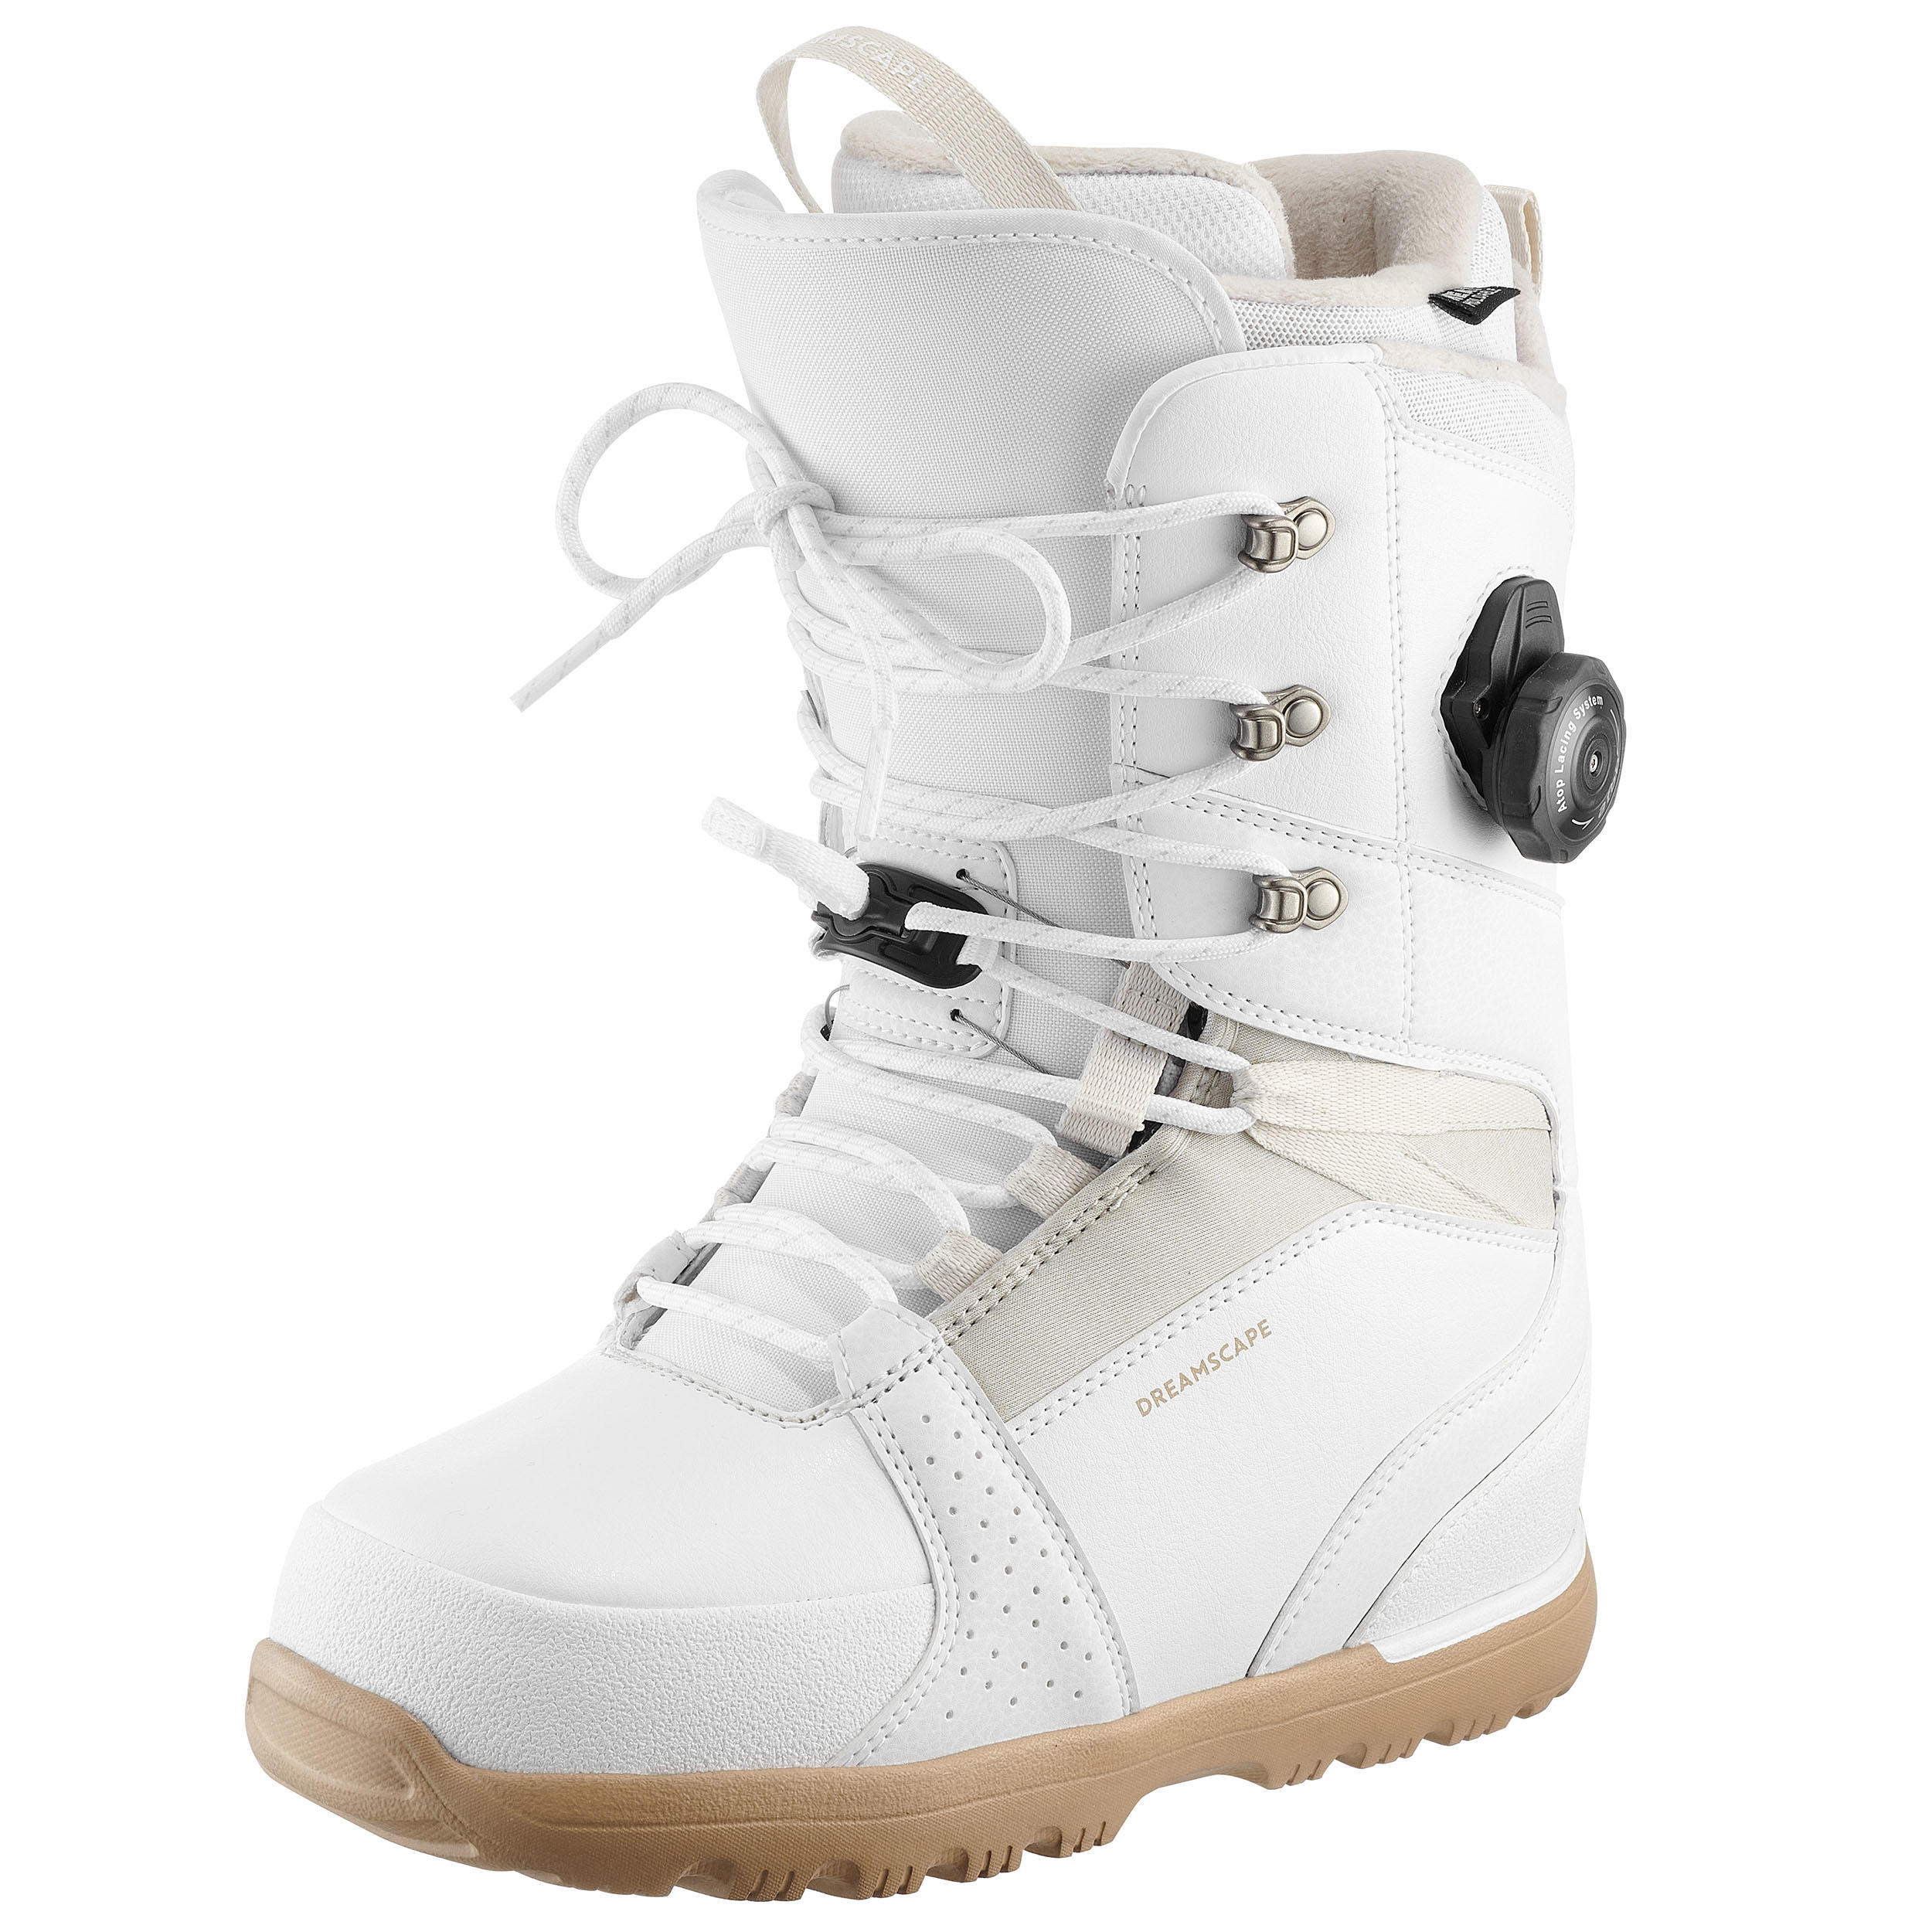 Boots snowboard Damă imagine